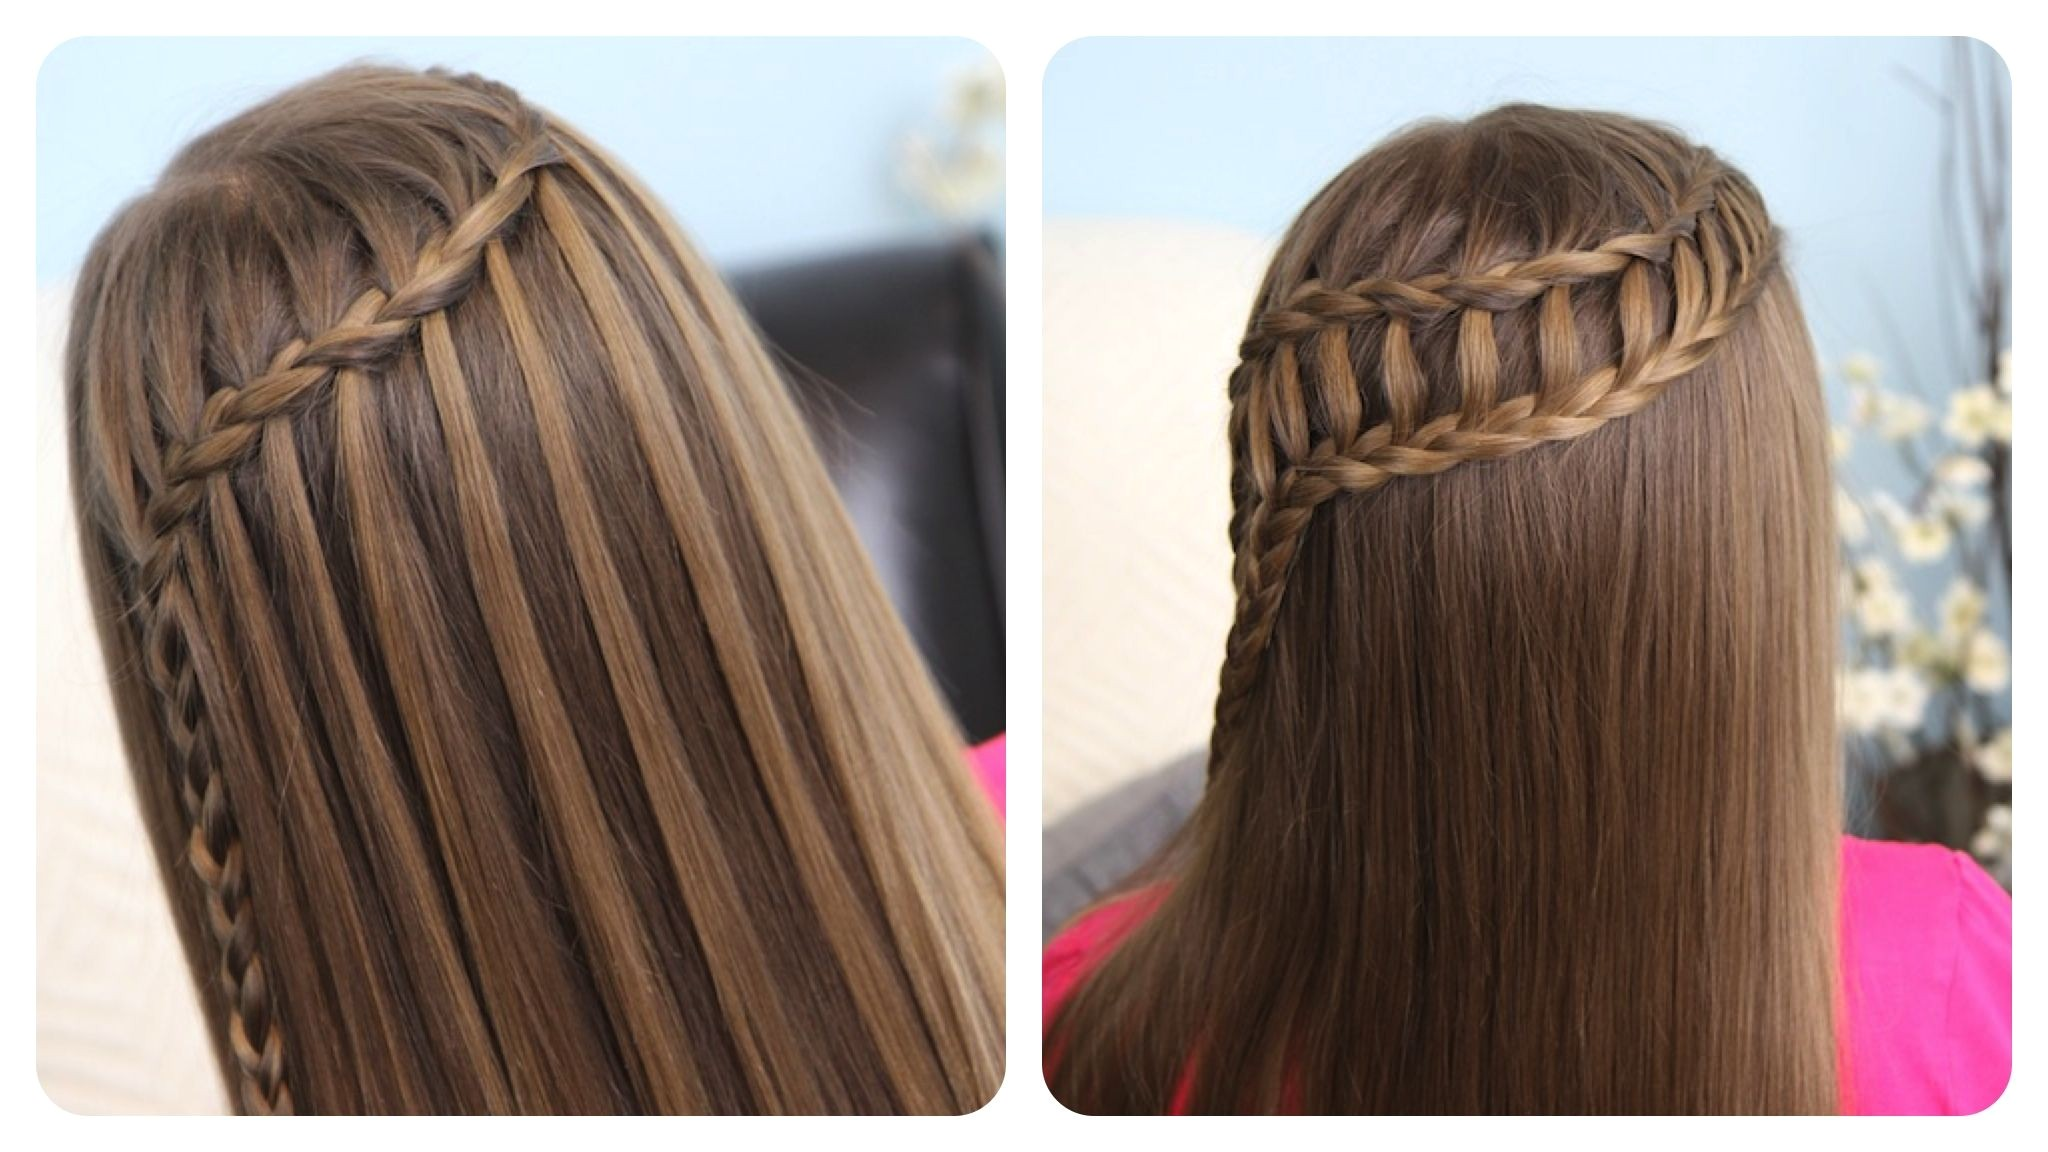 Cute Girls Hairstyles Ladder Braid Hairstyles Cute Girl Hairstyles Waterfall Braid & Ladder Braid